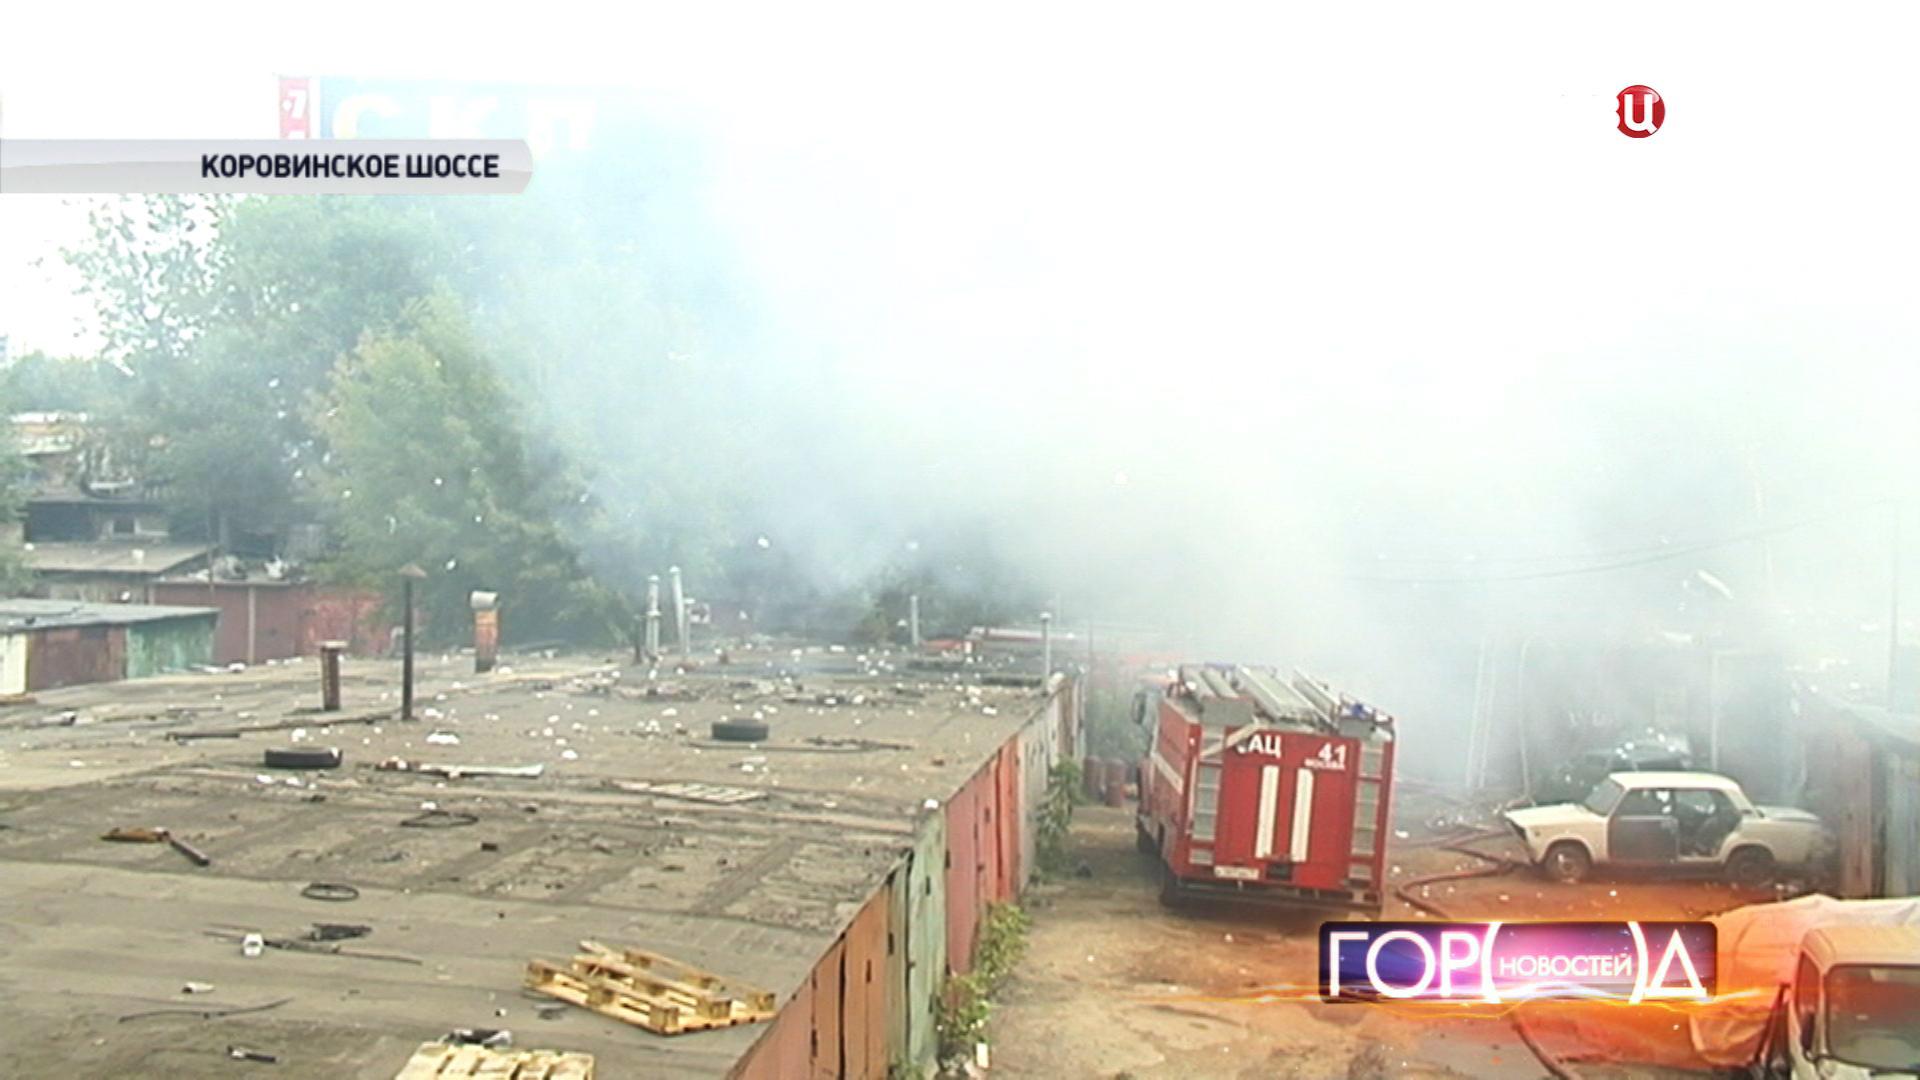 Пожар гаражей на Коровинском шоссе